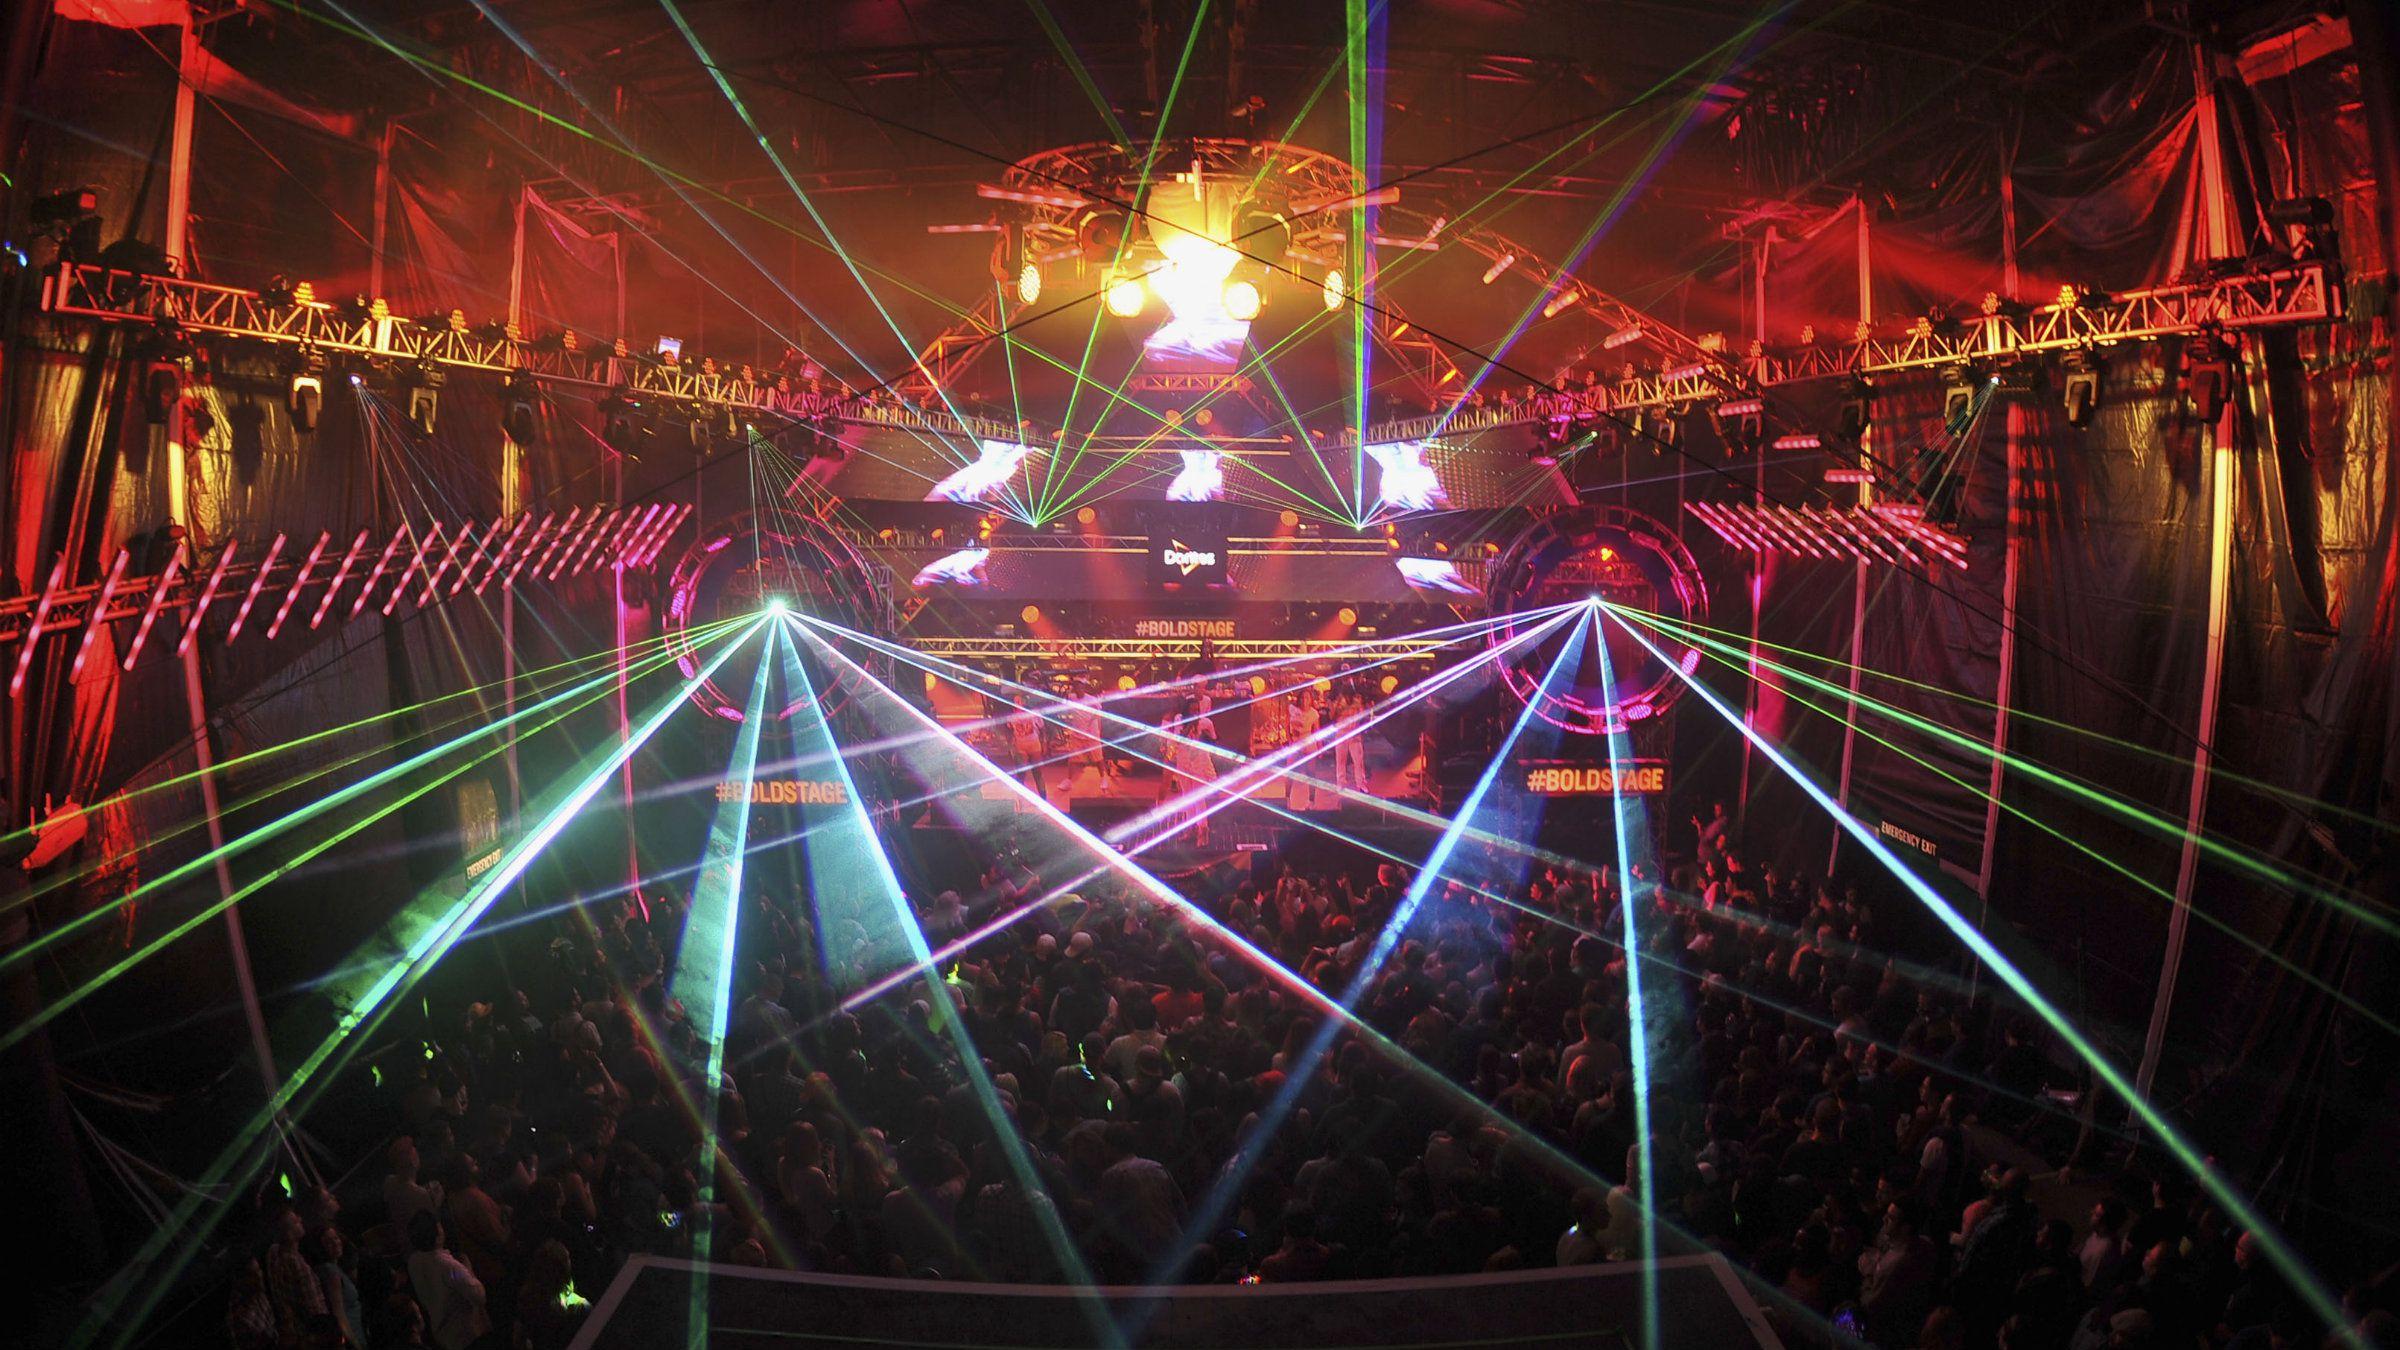 EDM music future rave culture